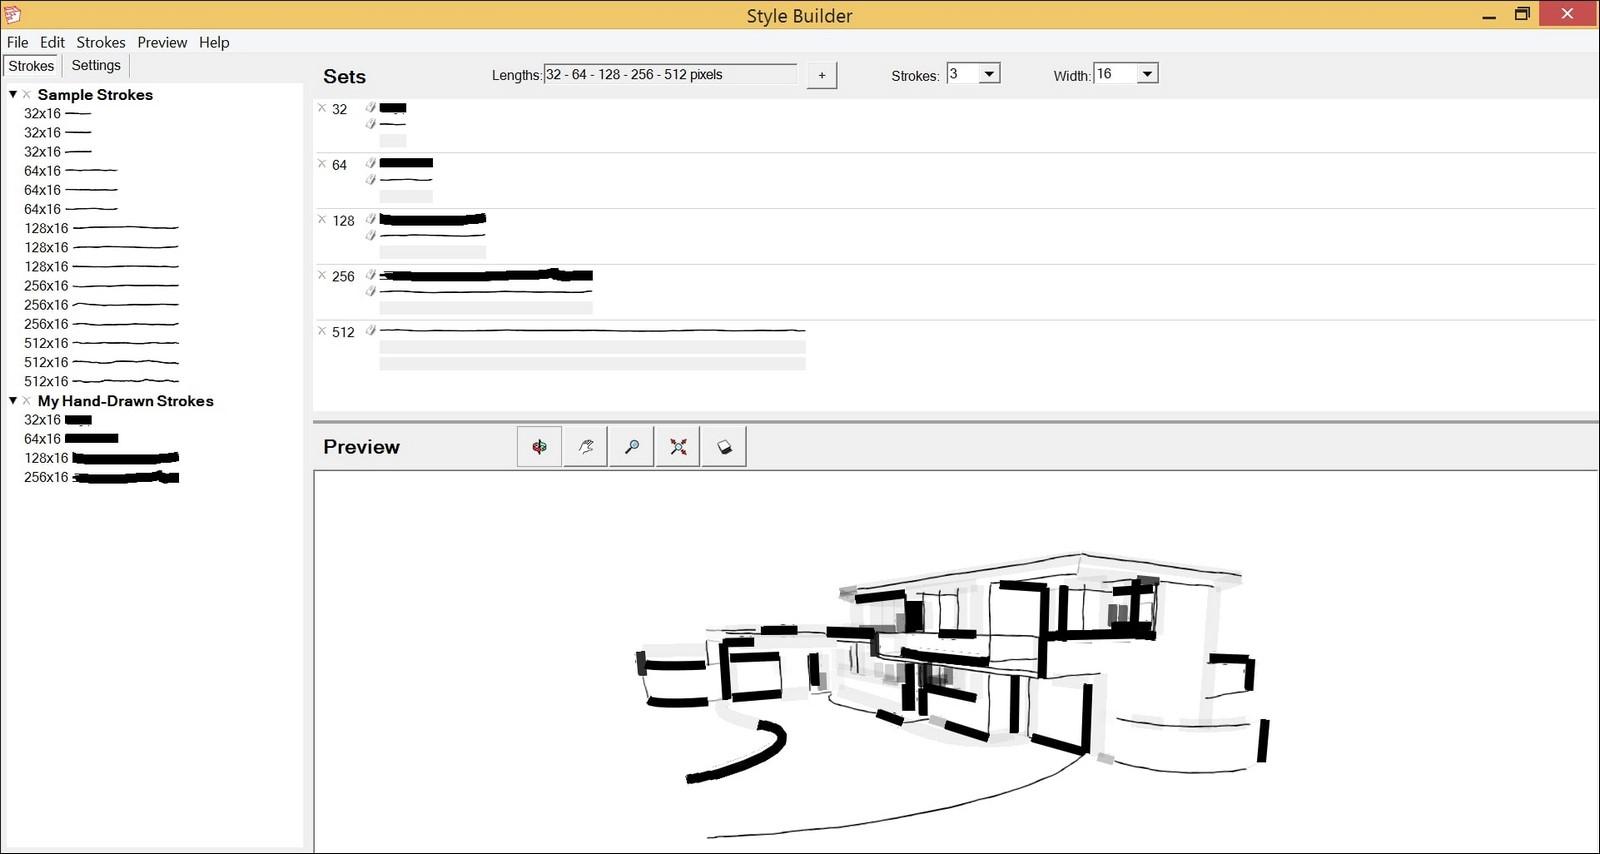 Creating sketch alike impression via Style Builder - Sheet1